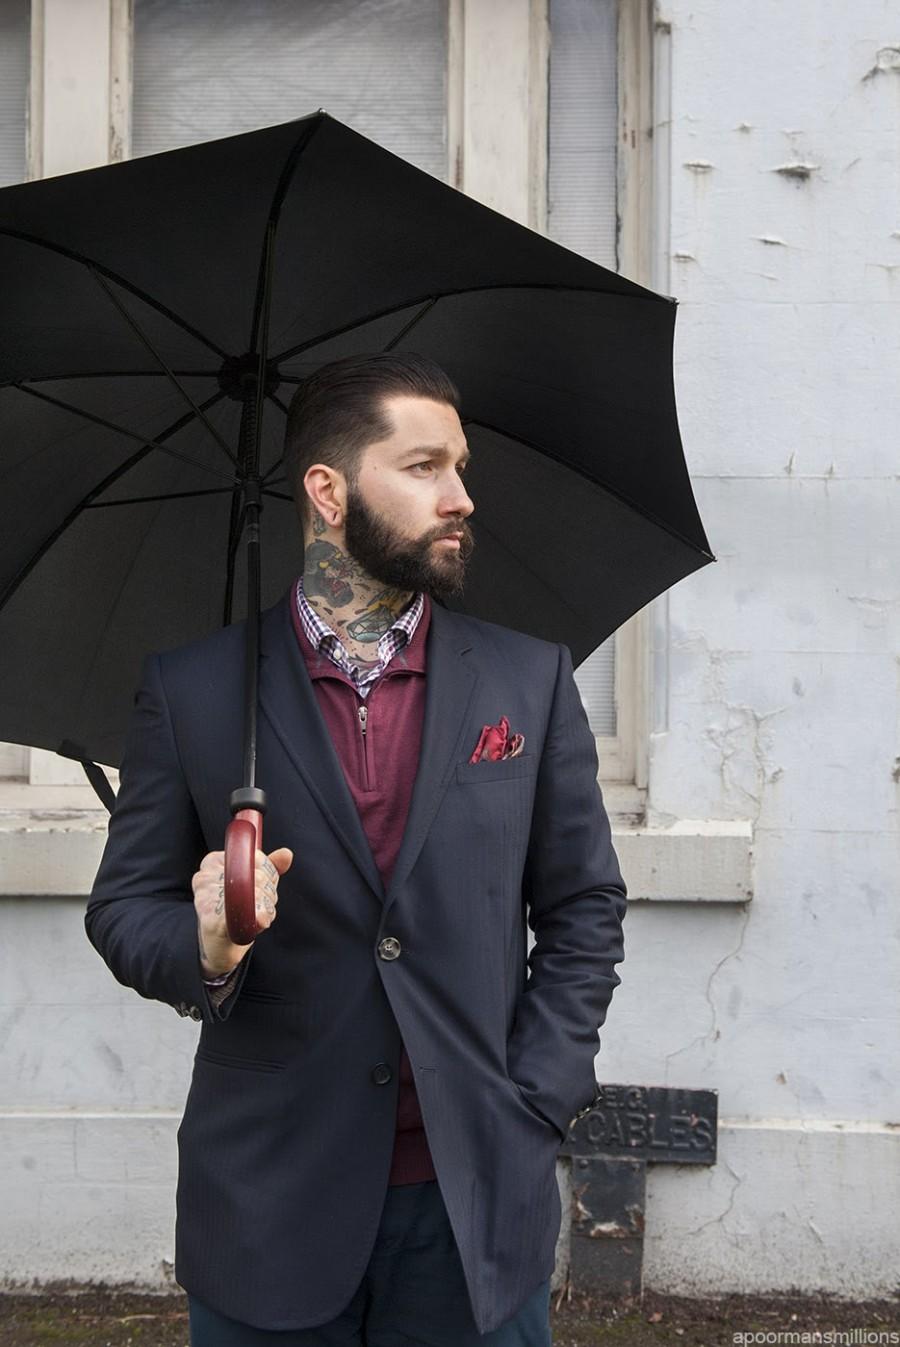 rainy-australia-menswear-poor-mans-millions-umbrella-900x1347.jpg